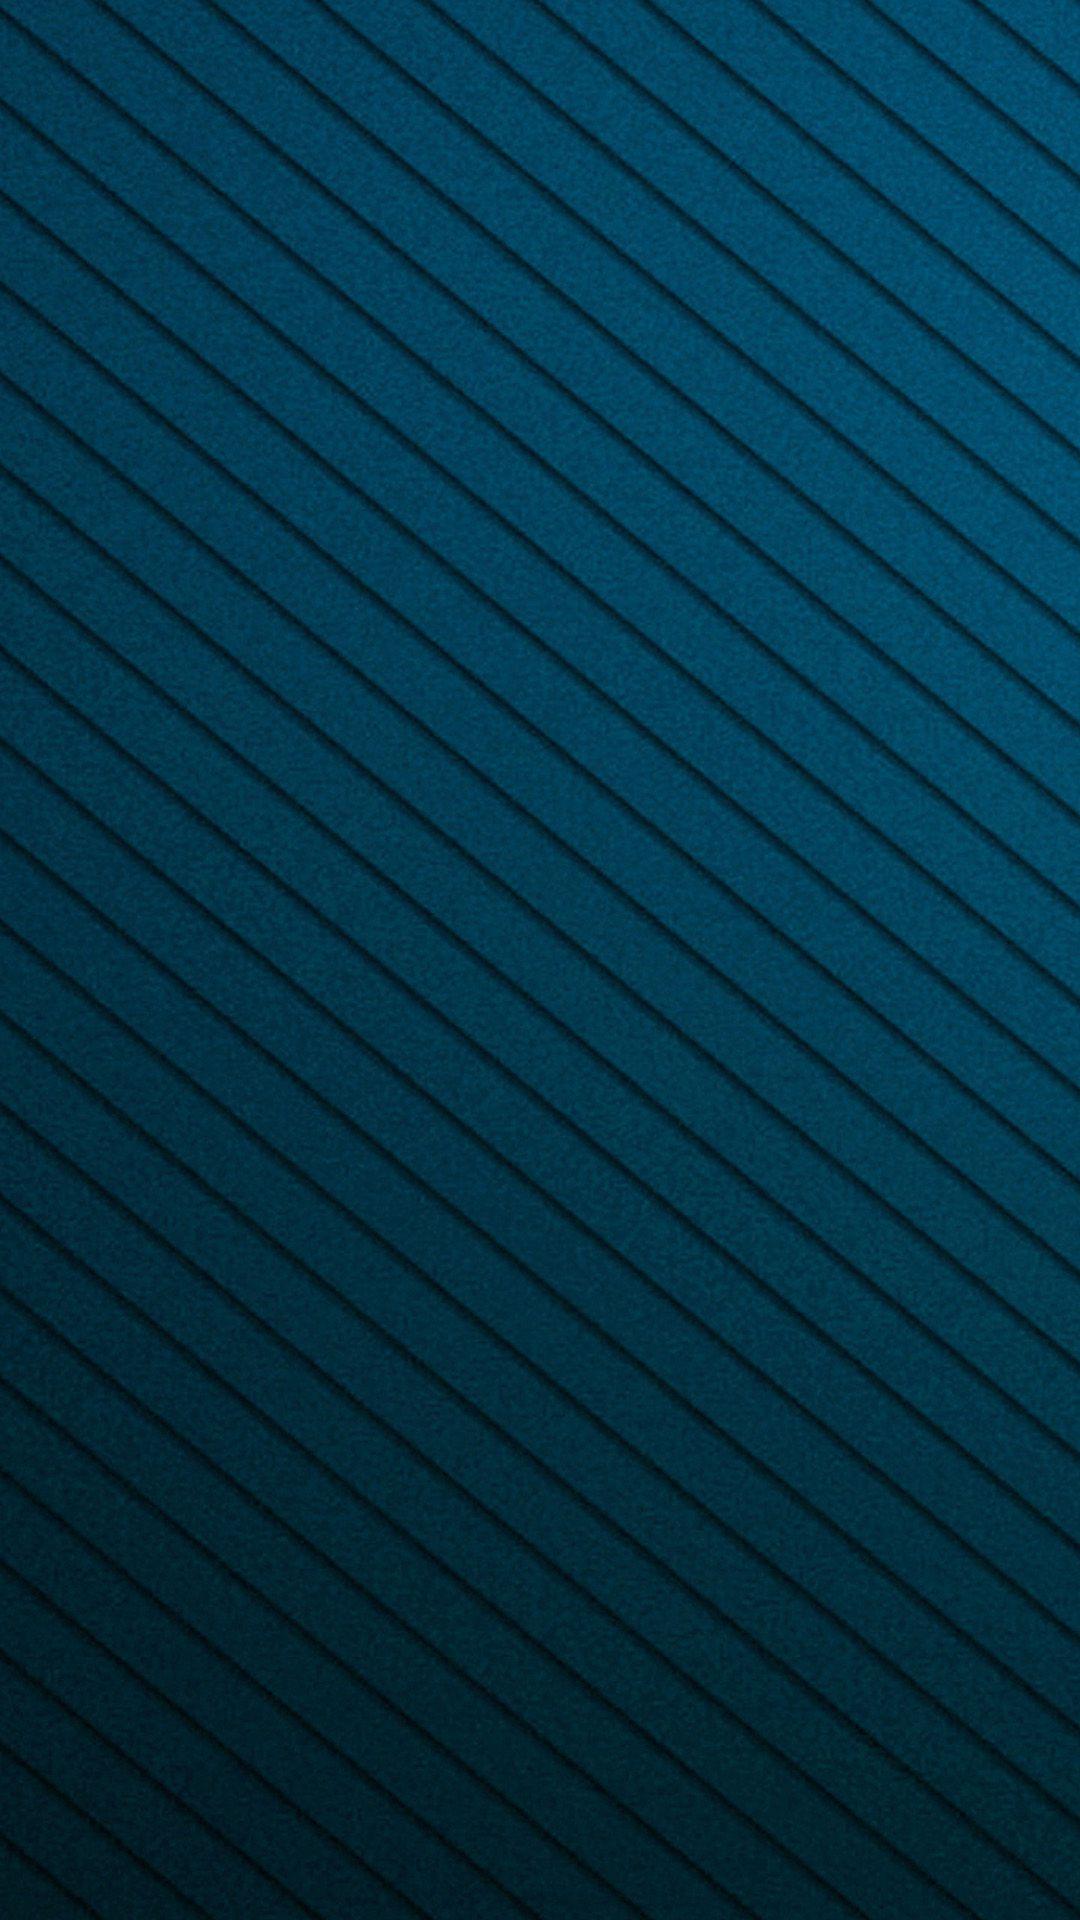 Samsung Galaxy S5 Wallpaper: Best Samsung Galaxy S5 Wallpapers